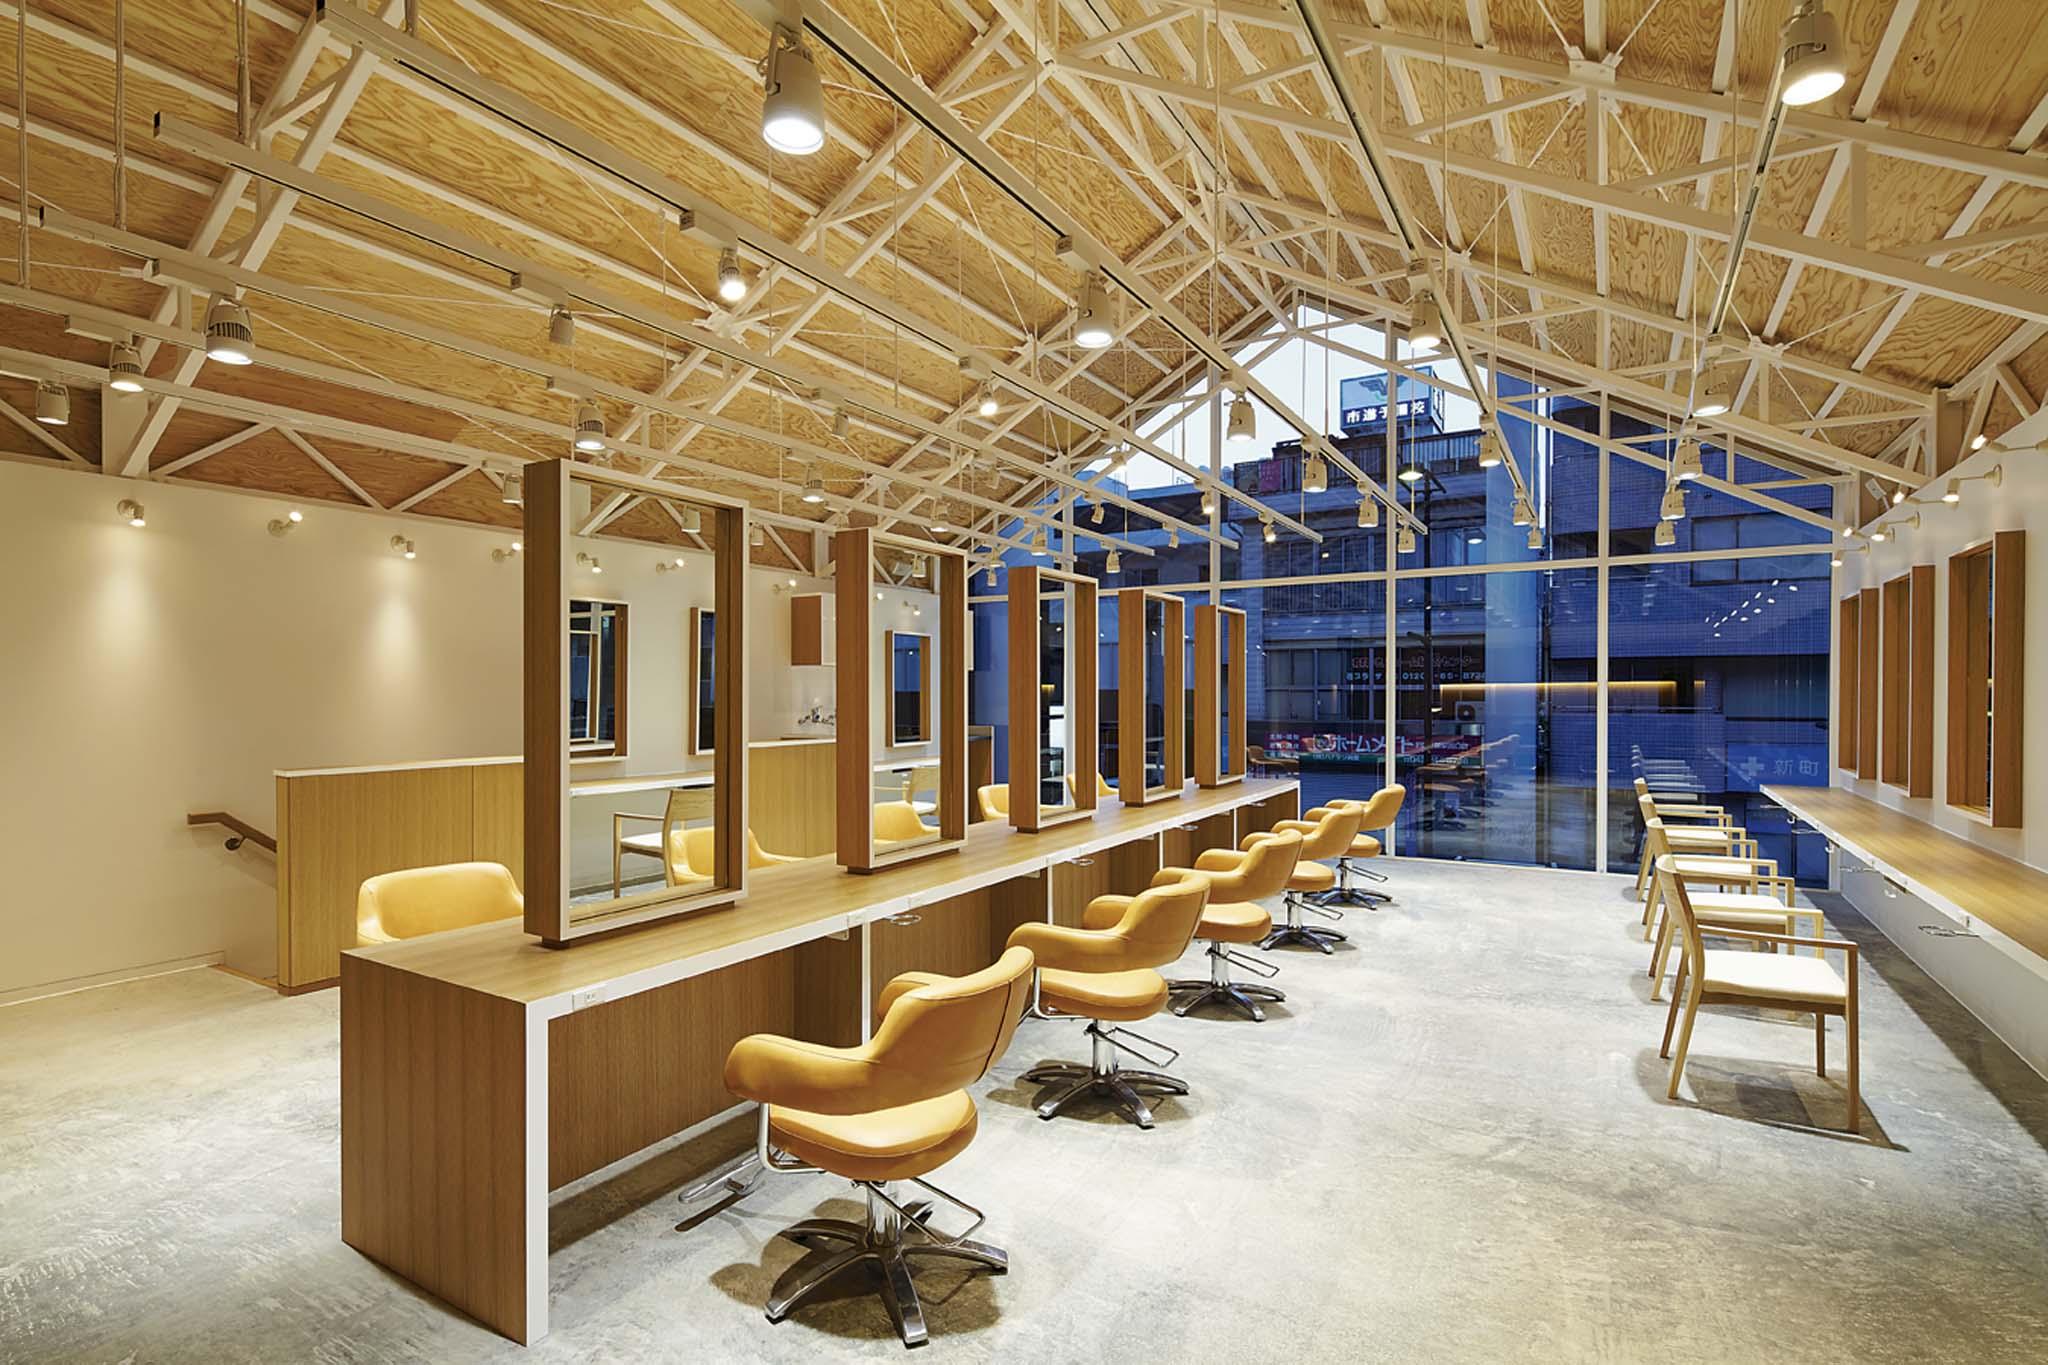 Ryo matsui architects salon de coiffure chiba japon - Salon de coiffure cherche coiffeuse ...